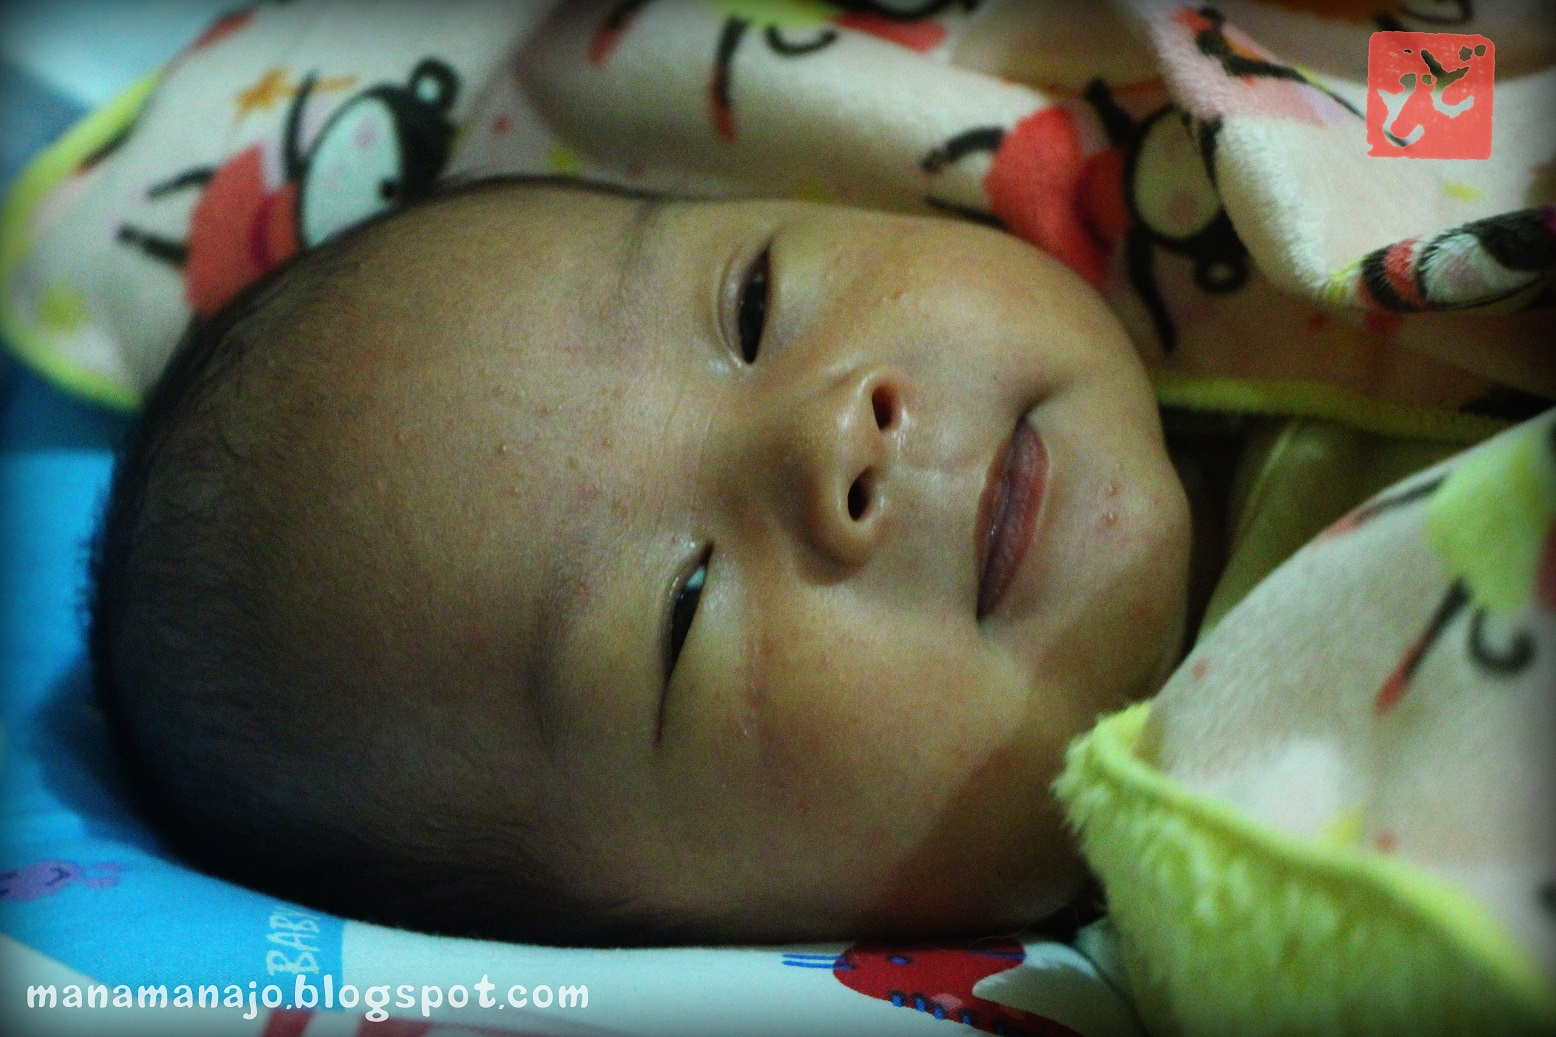 EXPelaut Punya Cerita 3 Minggu Babyapong